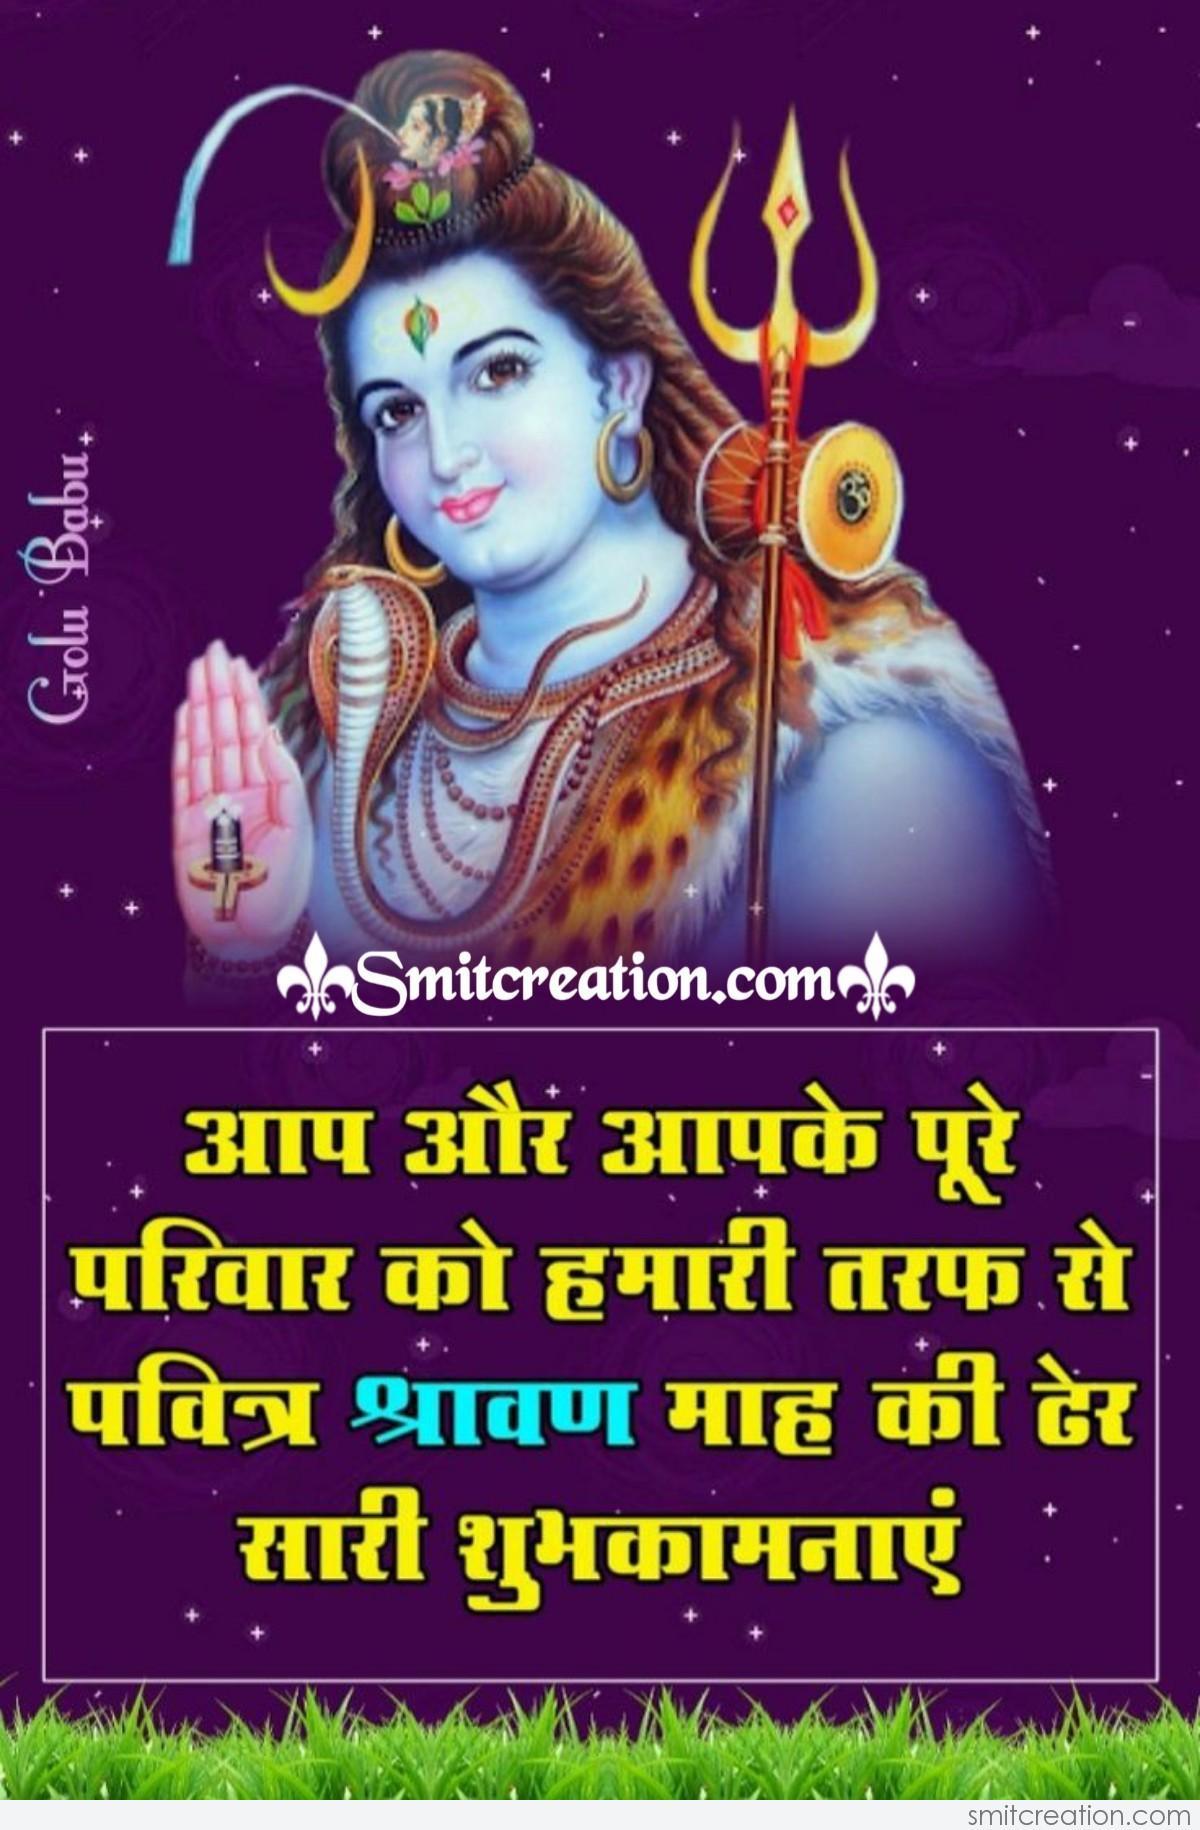 Shravan Mas Pictures and Graphics - SmitCreation com